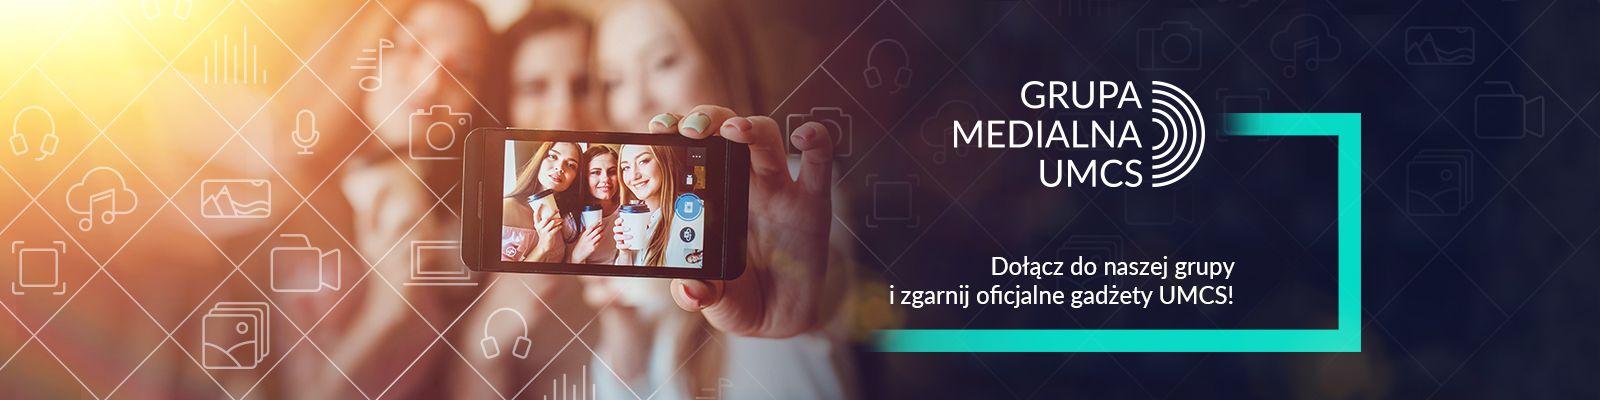 Grupa medialna UMCS